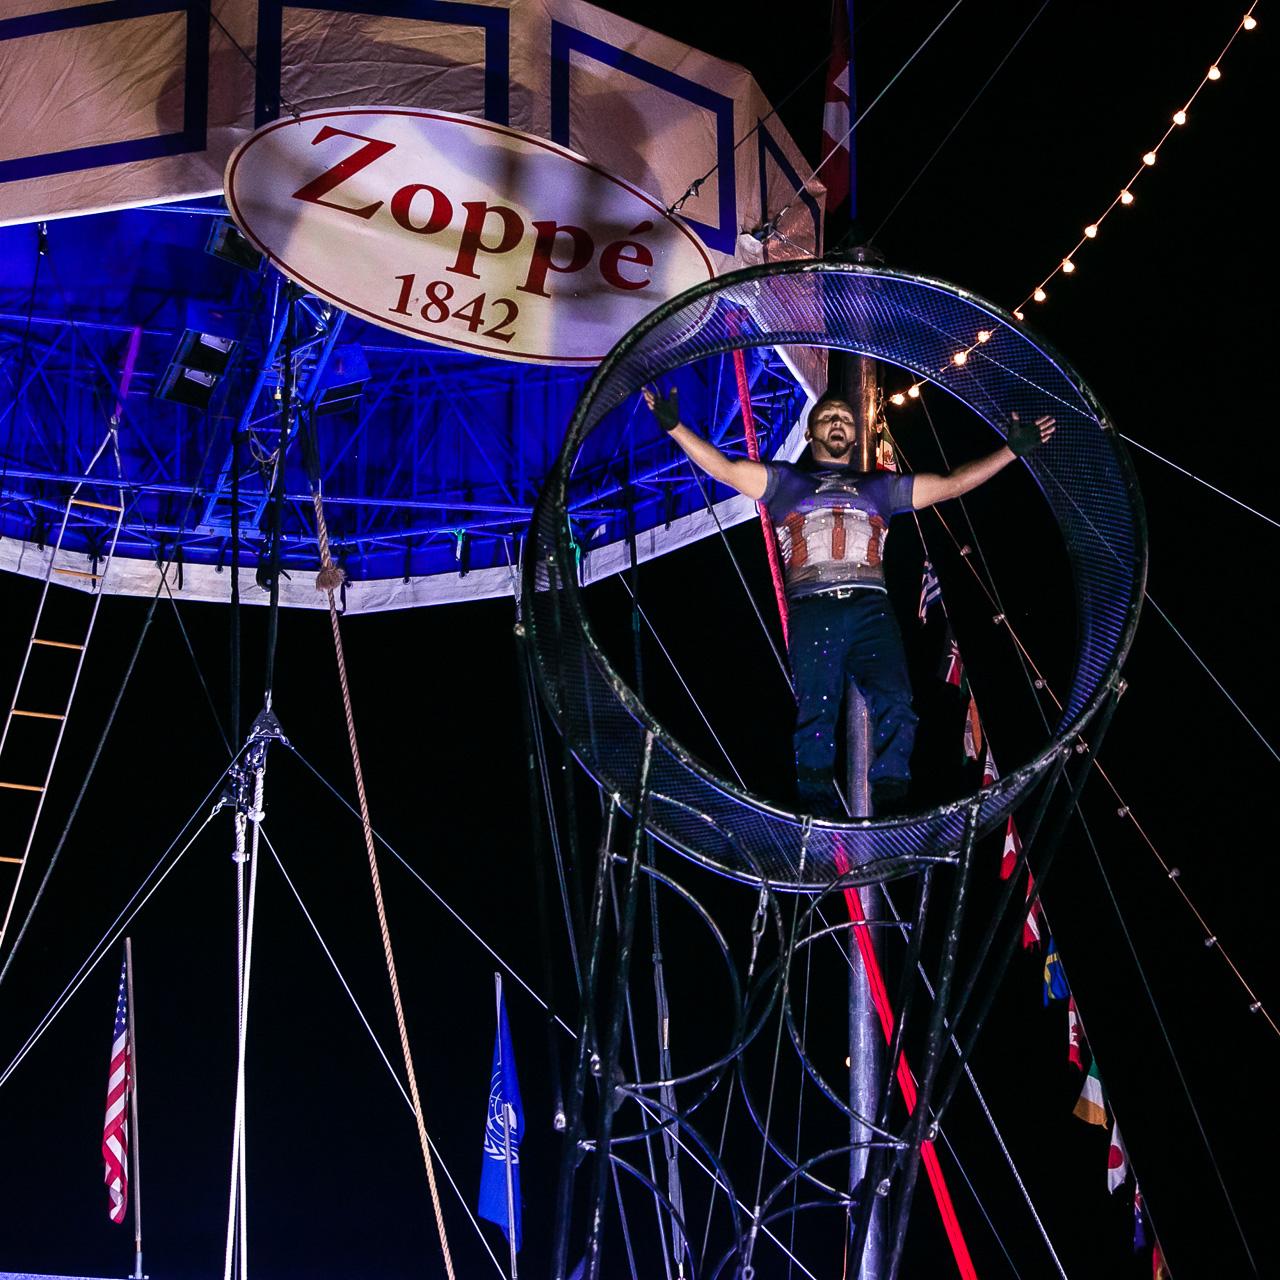 Zoppe Italian Family Circus!